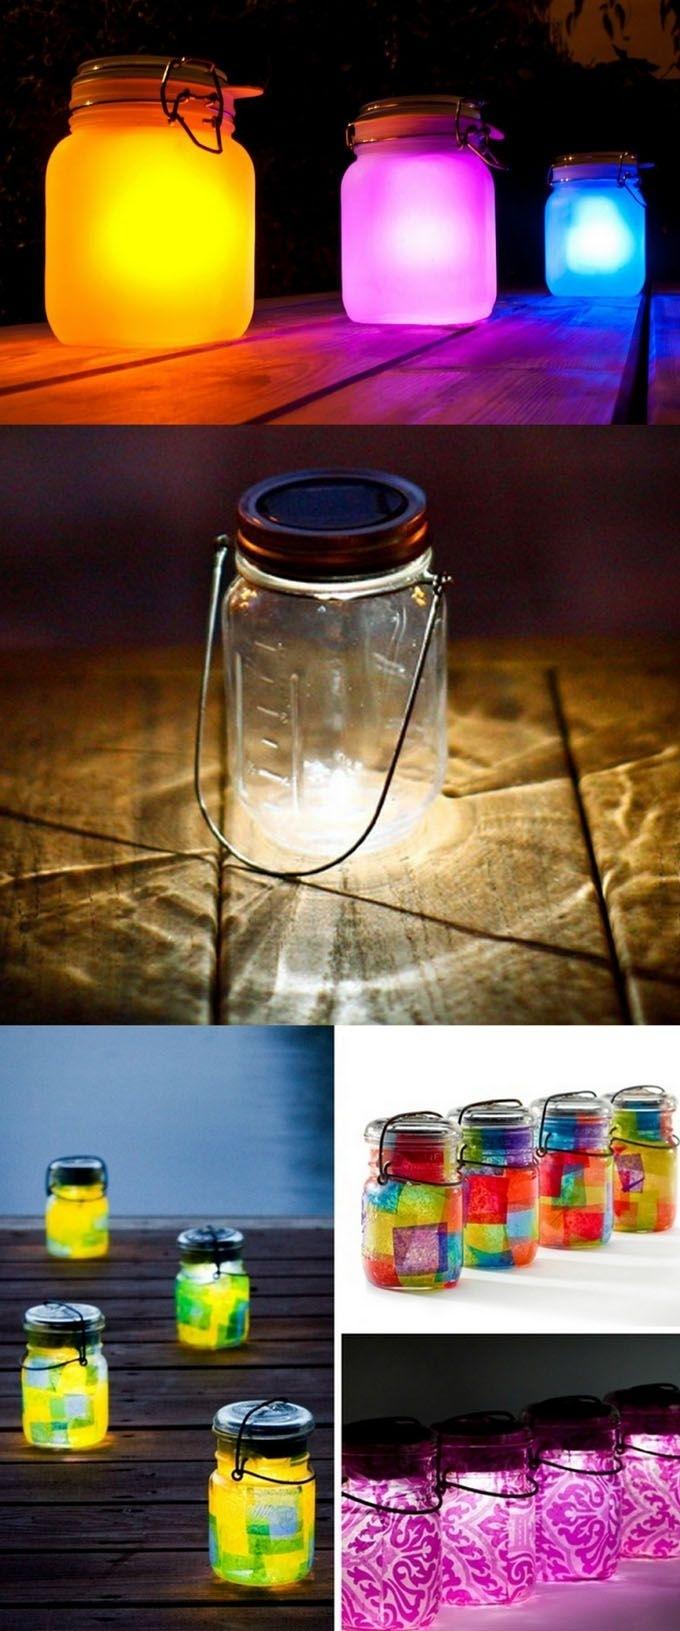 28 Stunning Diy Outdoor Lighting Ideas ( & So Easy! ) | Hometalk intended for Outdoor Jar Lanterns (Image 1 of 20)